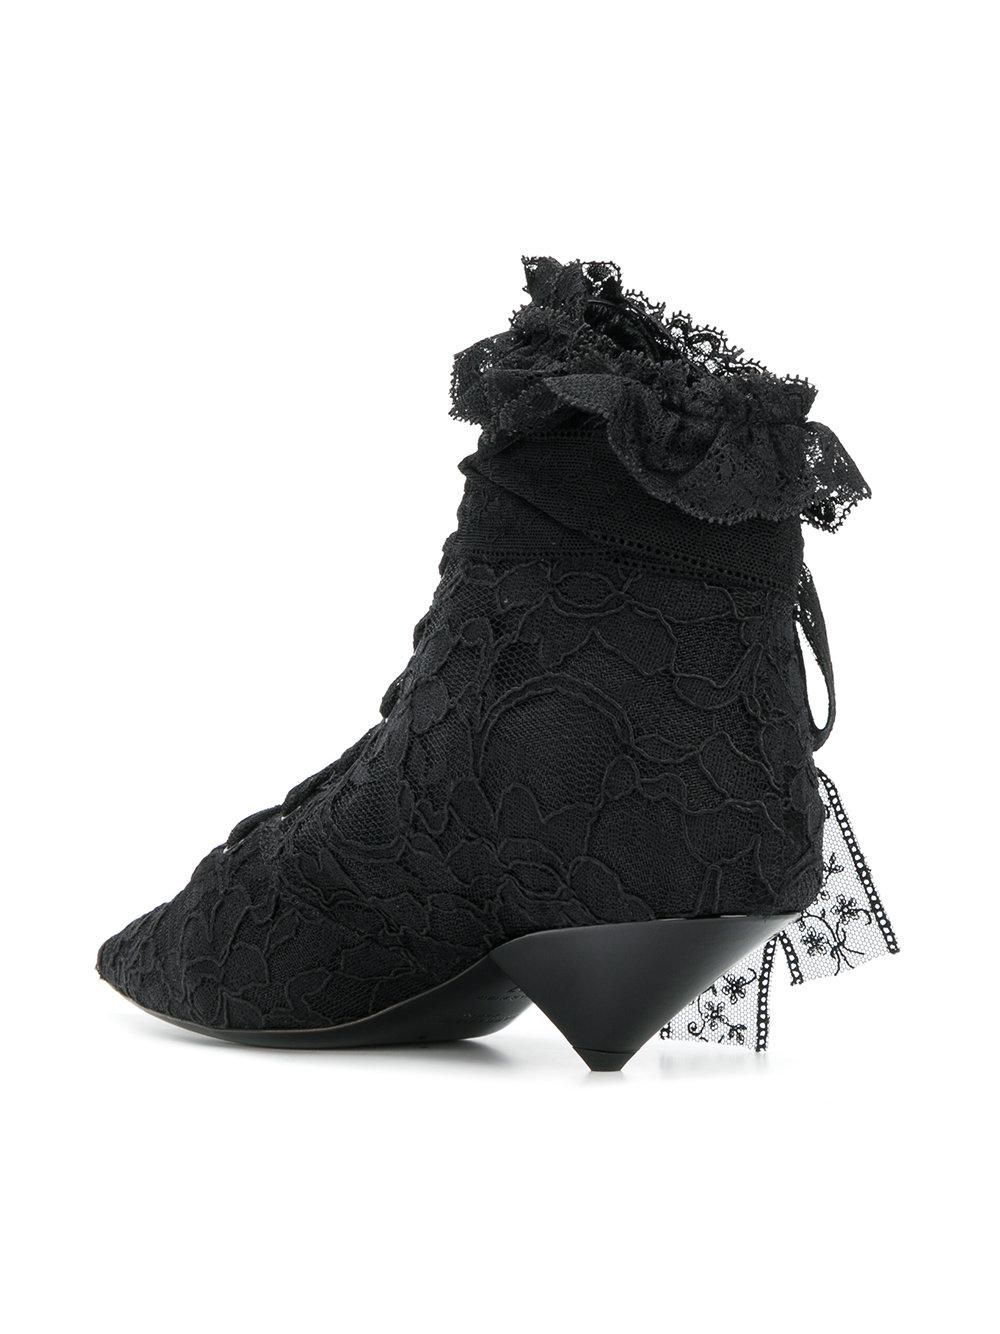 29af73a6f91 Saint Laurent Blaze 45 Lace Ankle Boots in Black - Lyst